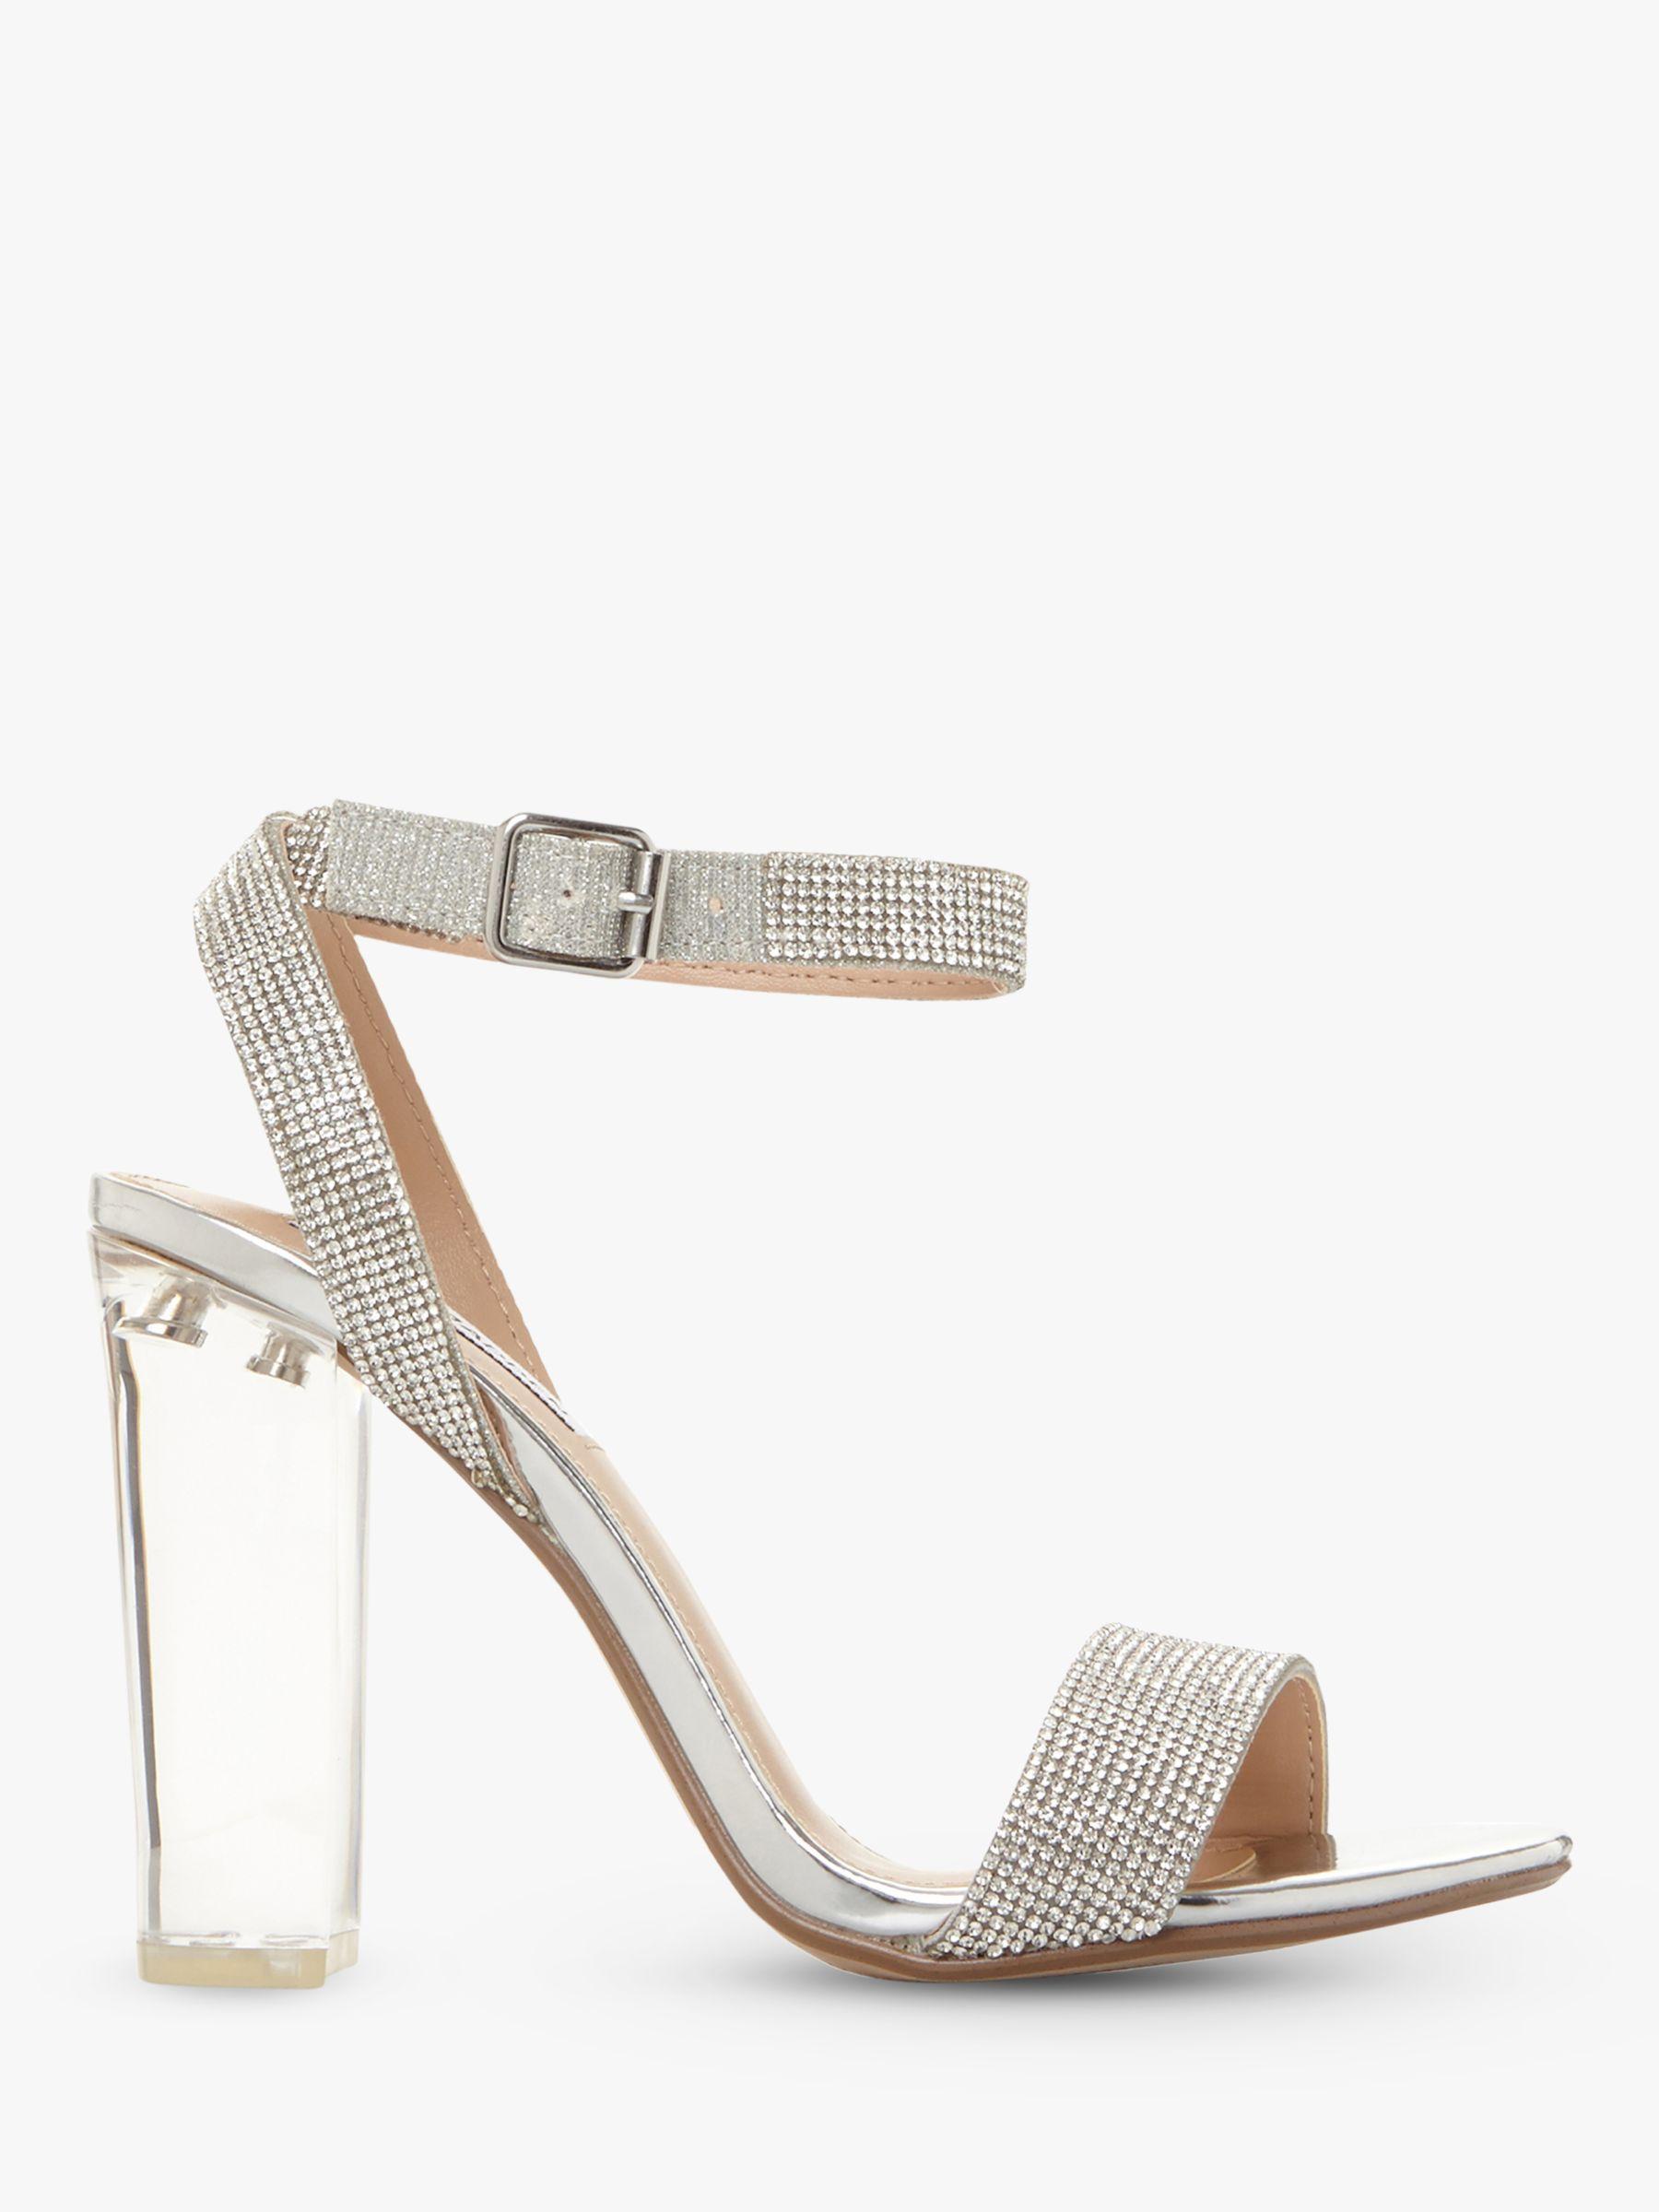 a6656bc8e486 Steve Madden Crysler Crystal High Block Heel Sandals in Metallic - Lyst